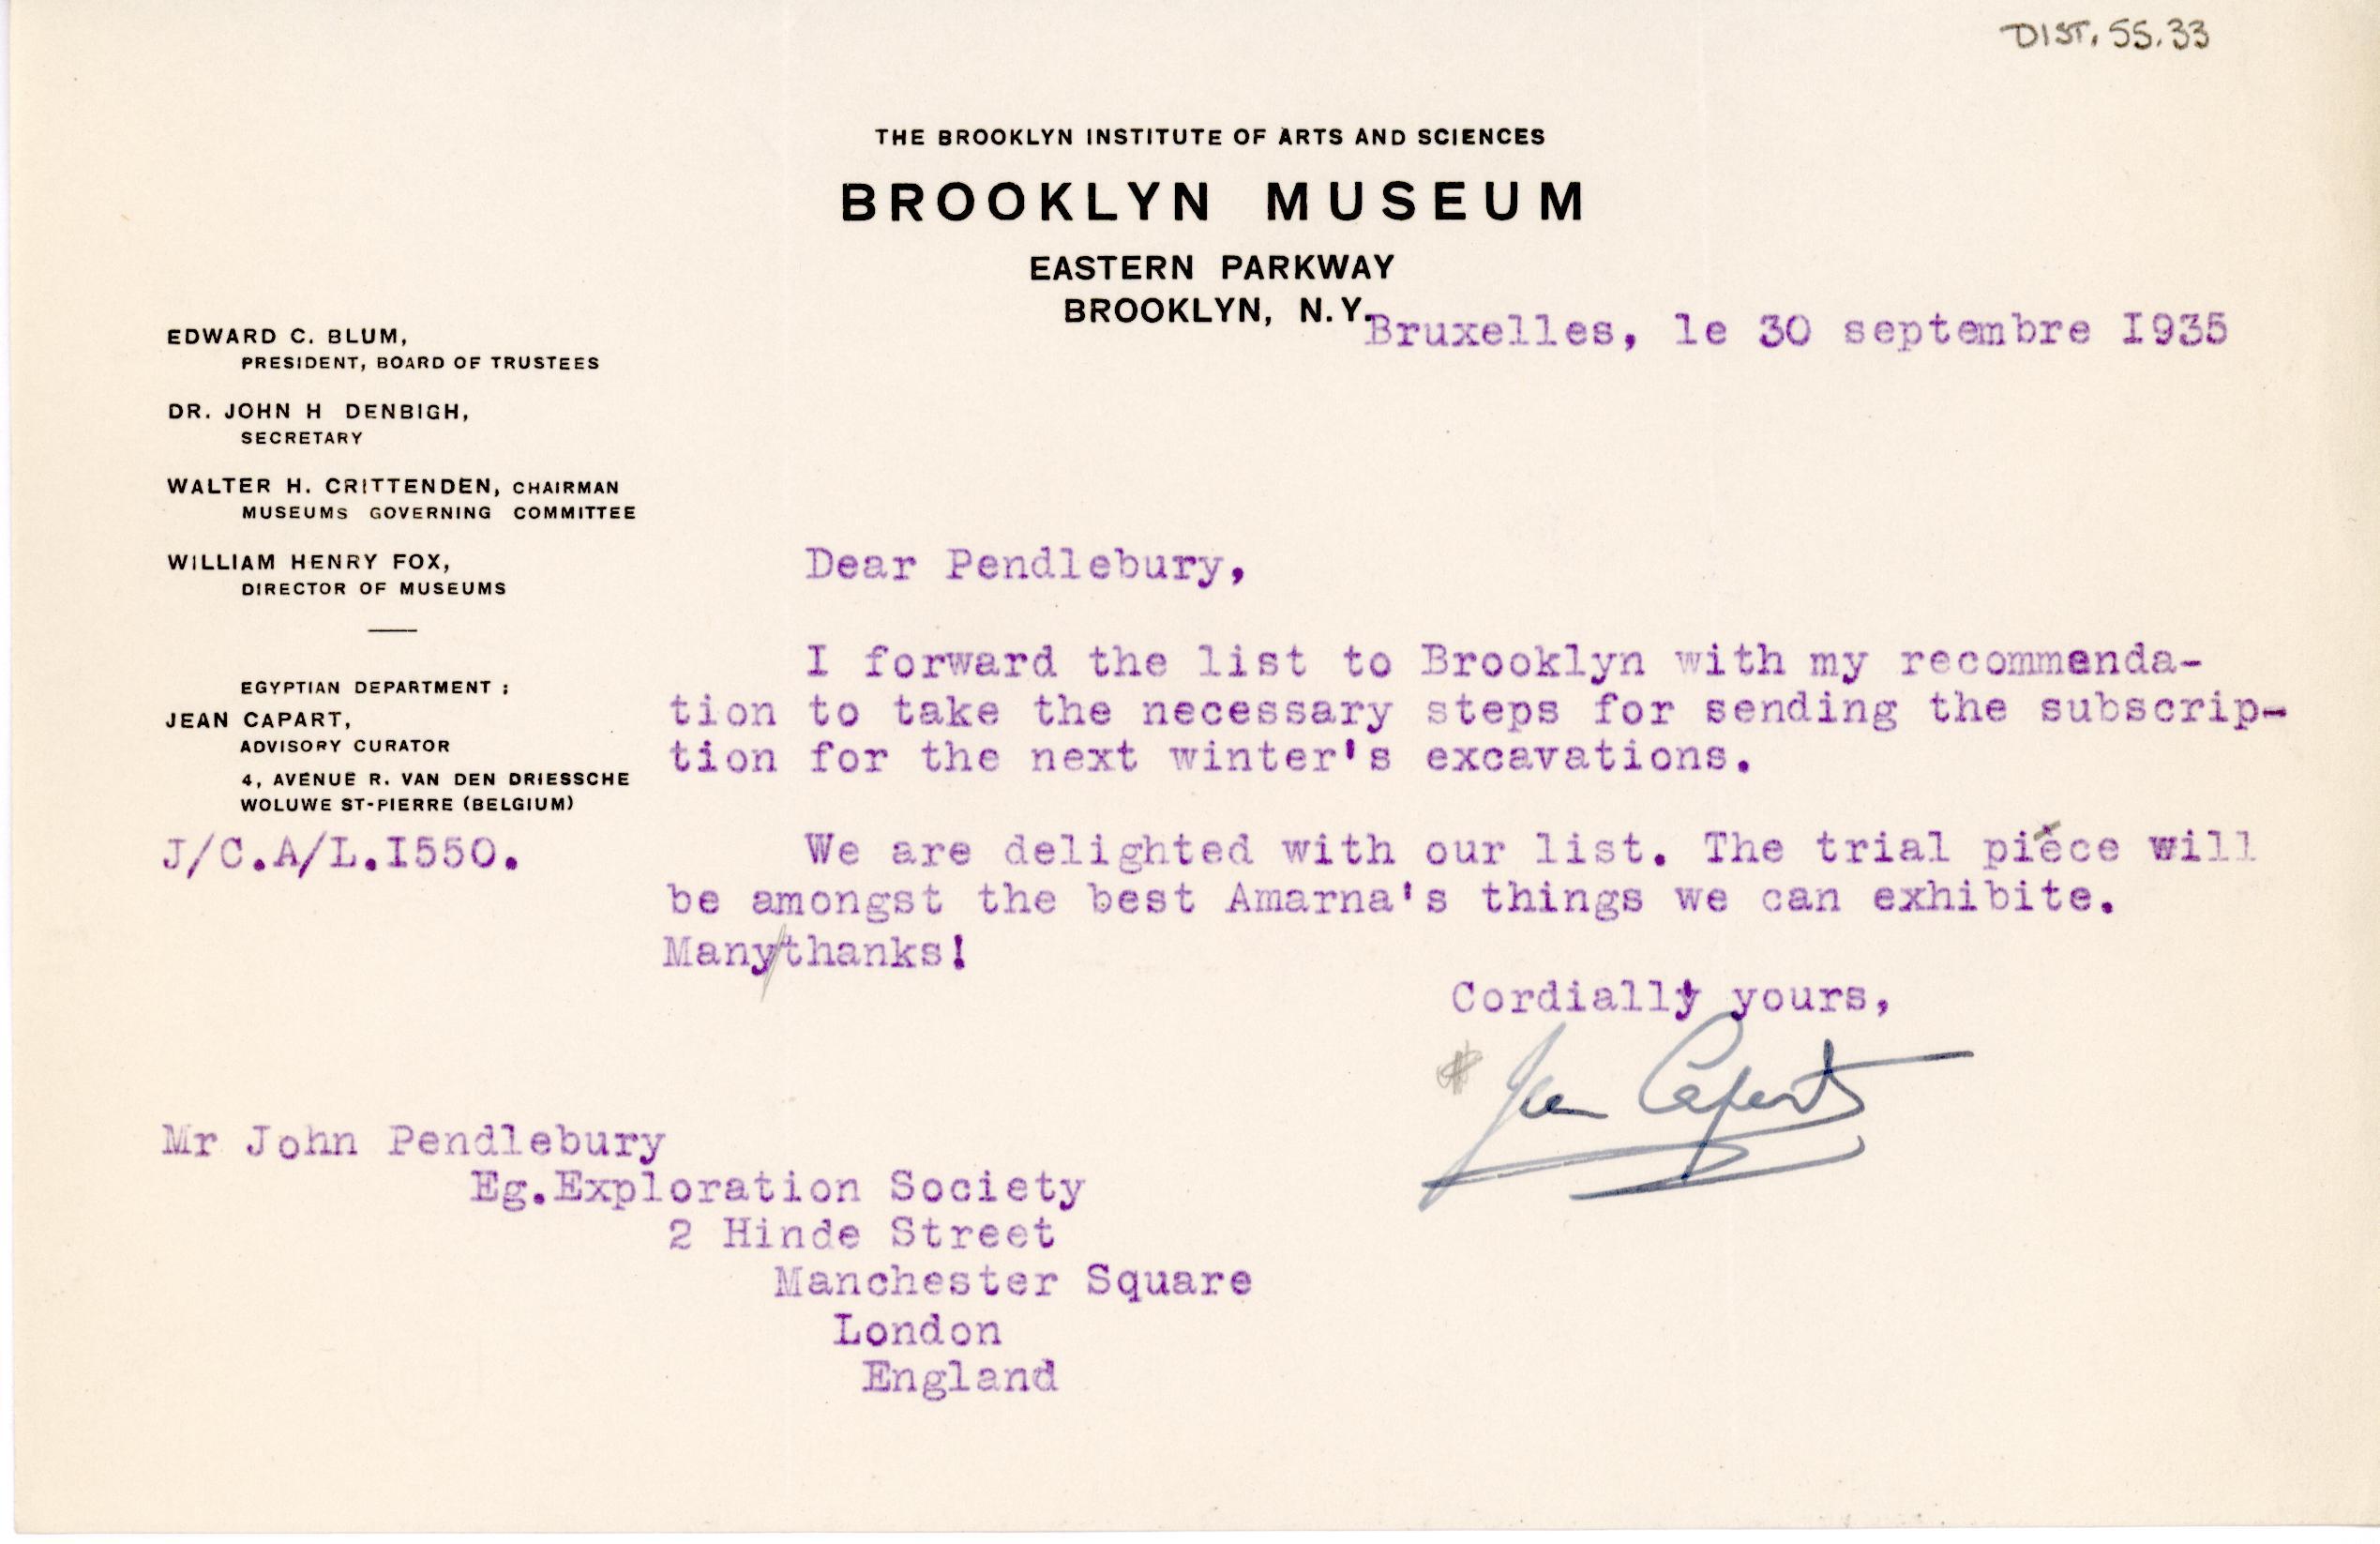 1931-44 Brooklyn Museum DIST.55.33